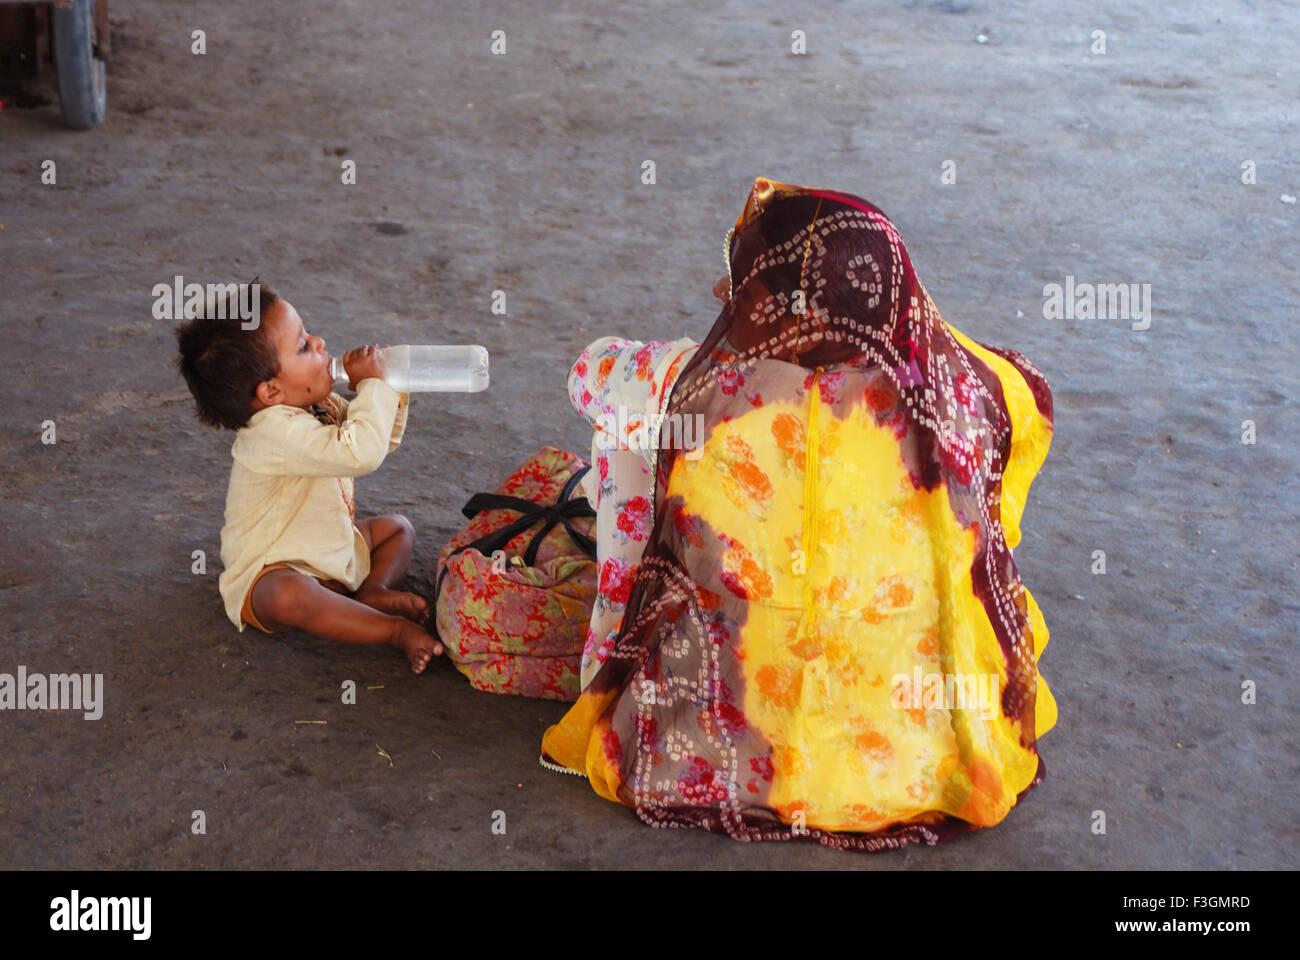 A child quenching thirst at railway platform ; Rajasthan ; India - Stock Image